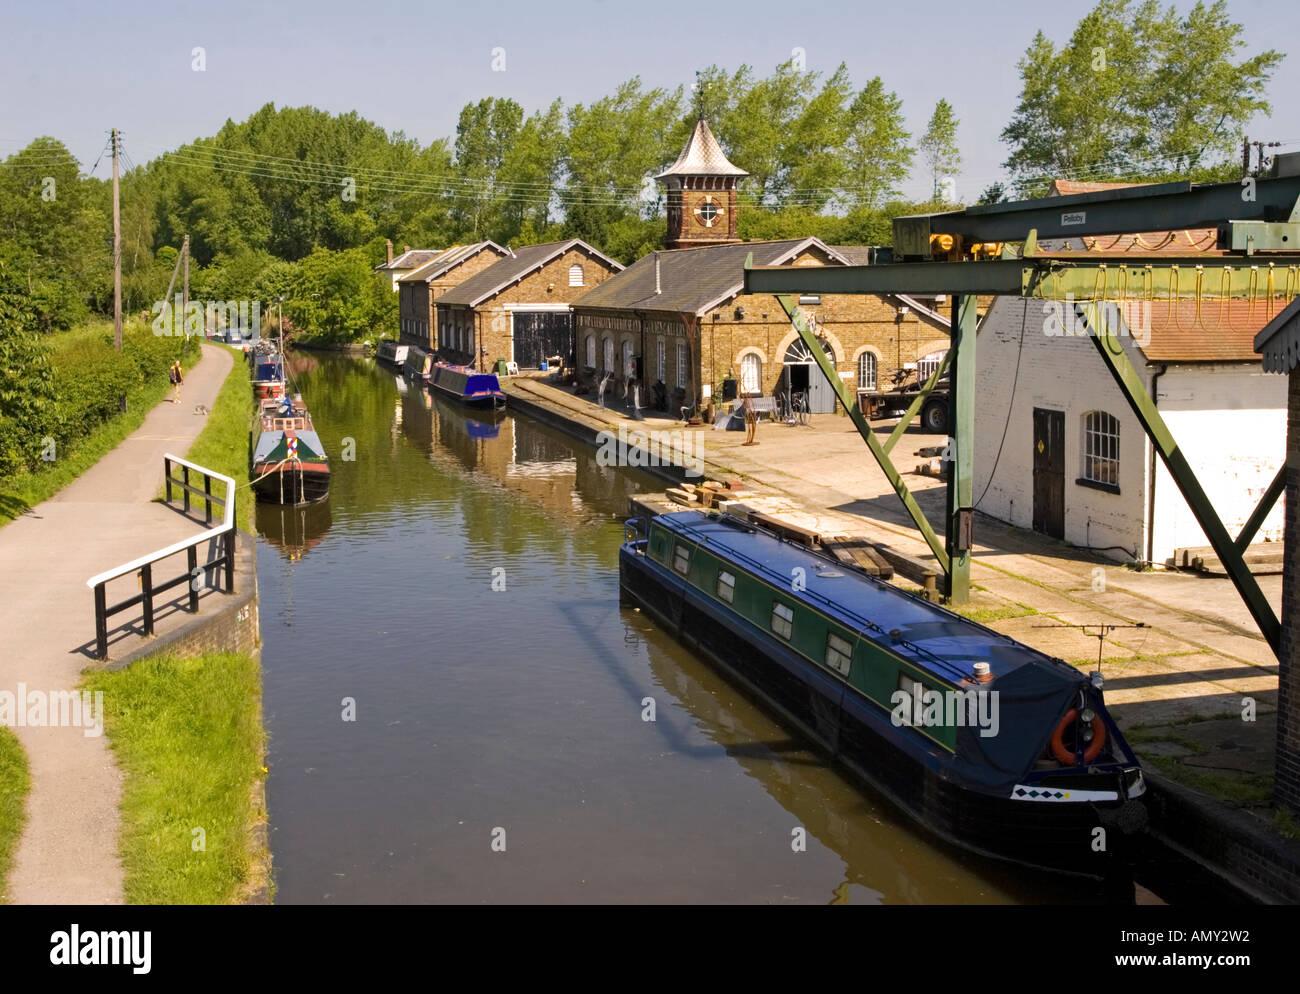 Former British Waterways Yard - Bulbourne - Tring - Hertfordshire - Stock Image